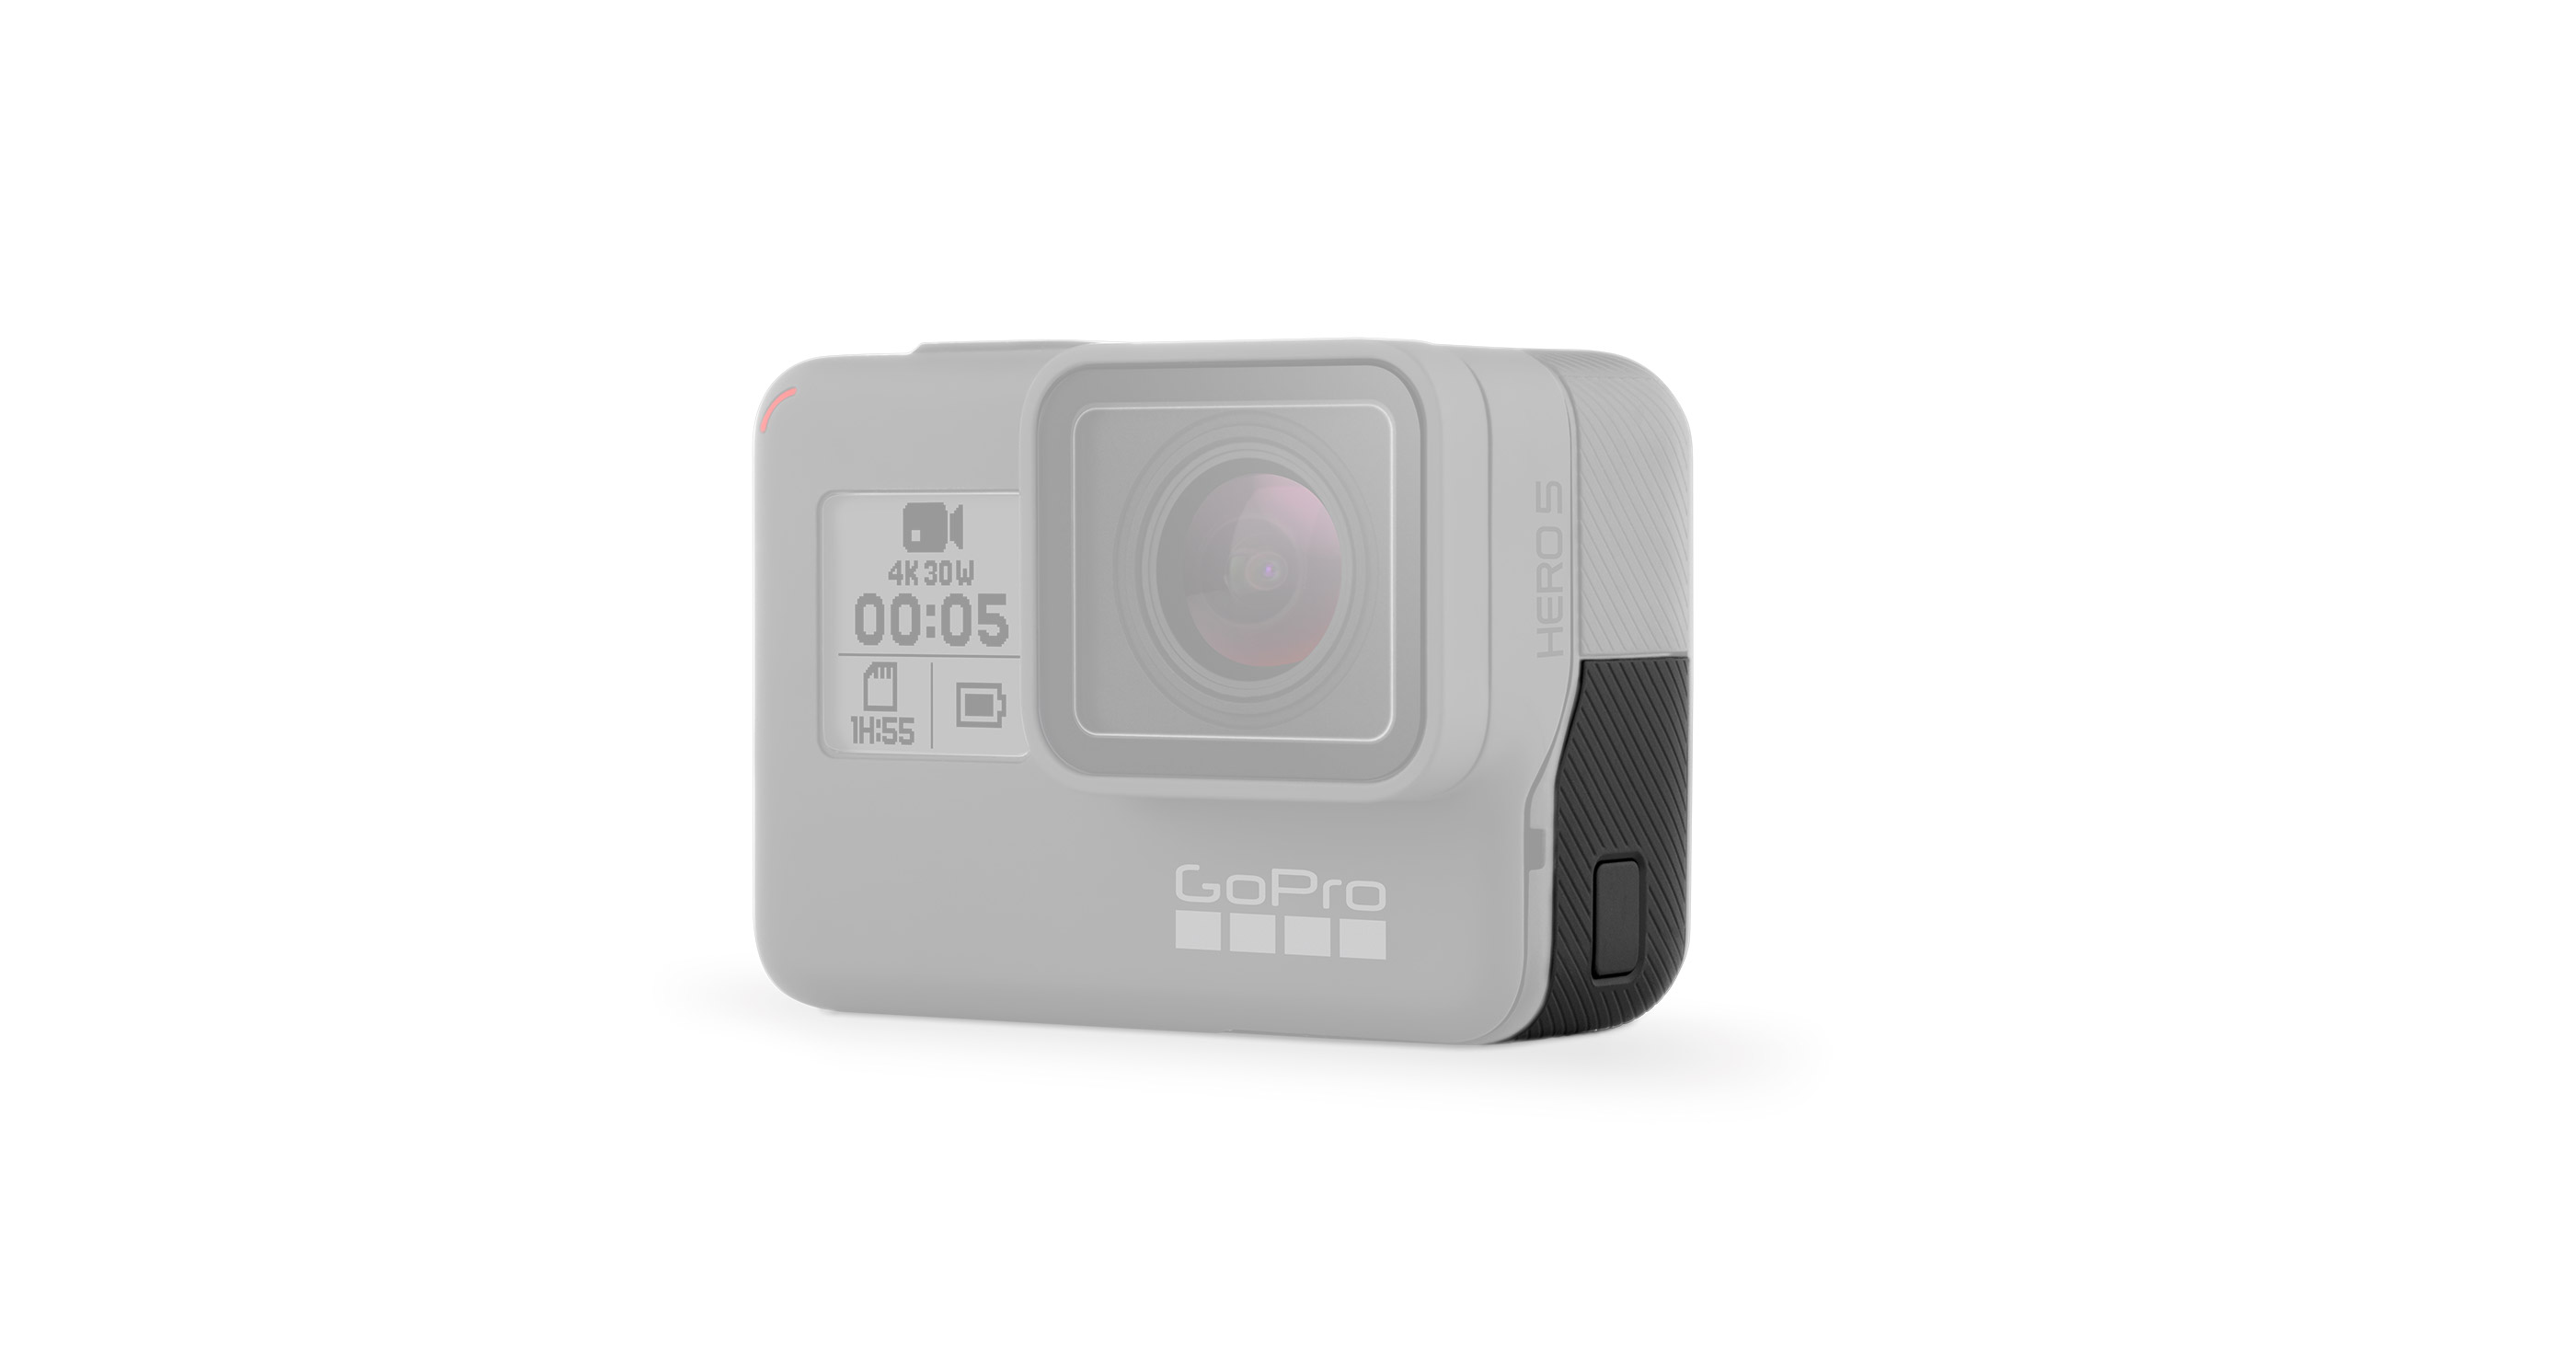 Capac lateral GoPro AAIOD-001 pentru HERO5